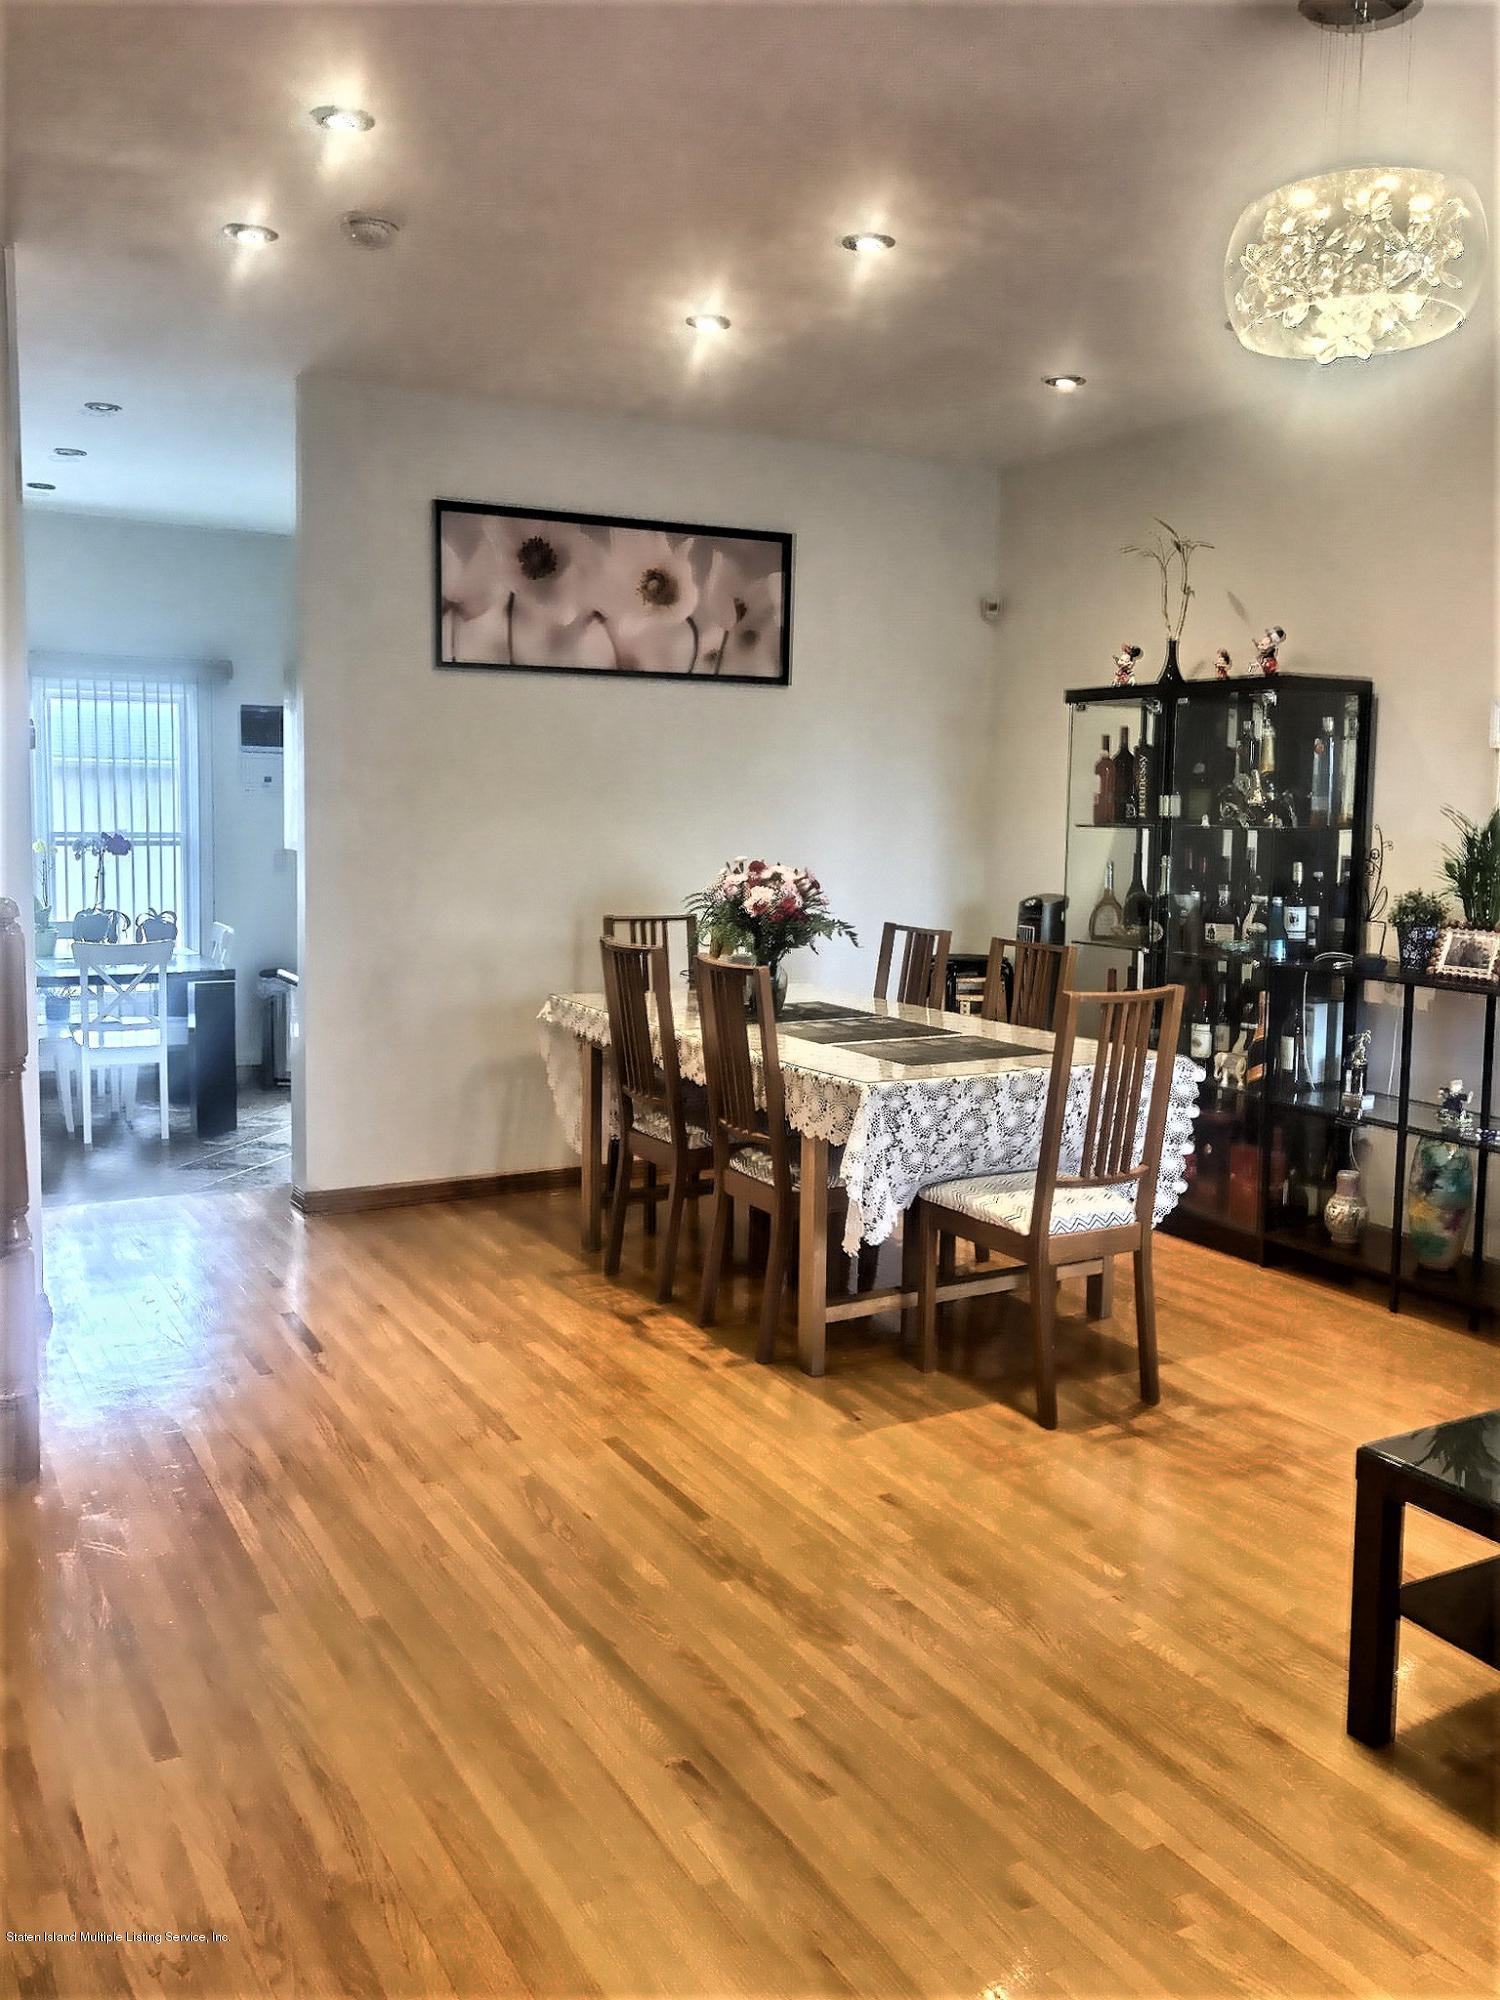 Single Family - Attached 58 Garretson Lane  Staten Island, NY 10304, MLS-1128138-18